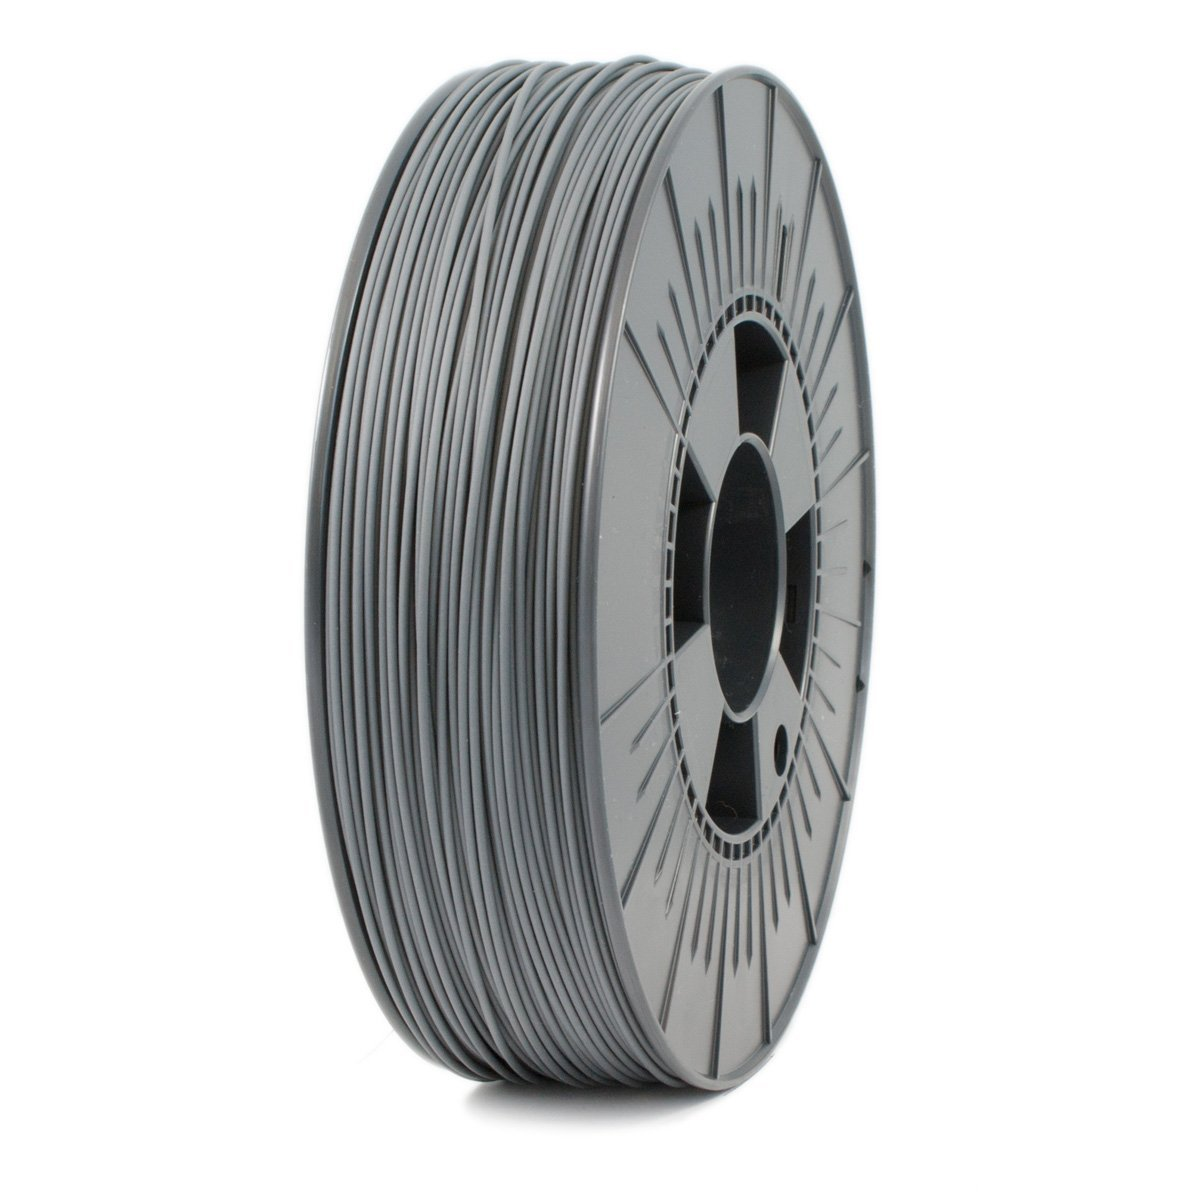 Ice Filaments  Gentle Grey HIPS 2.85 mm